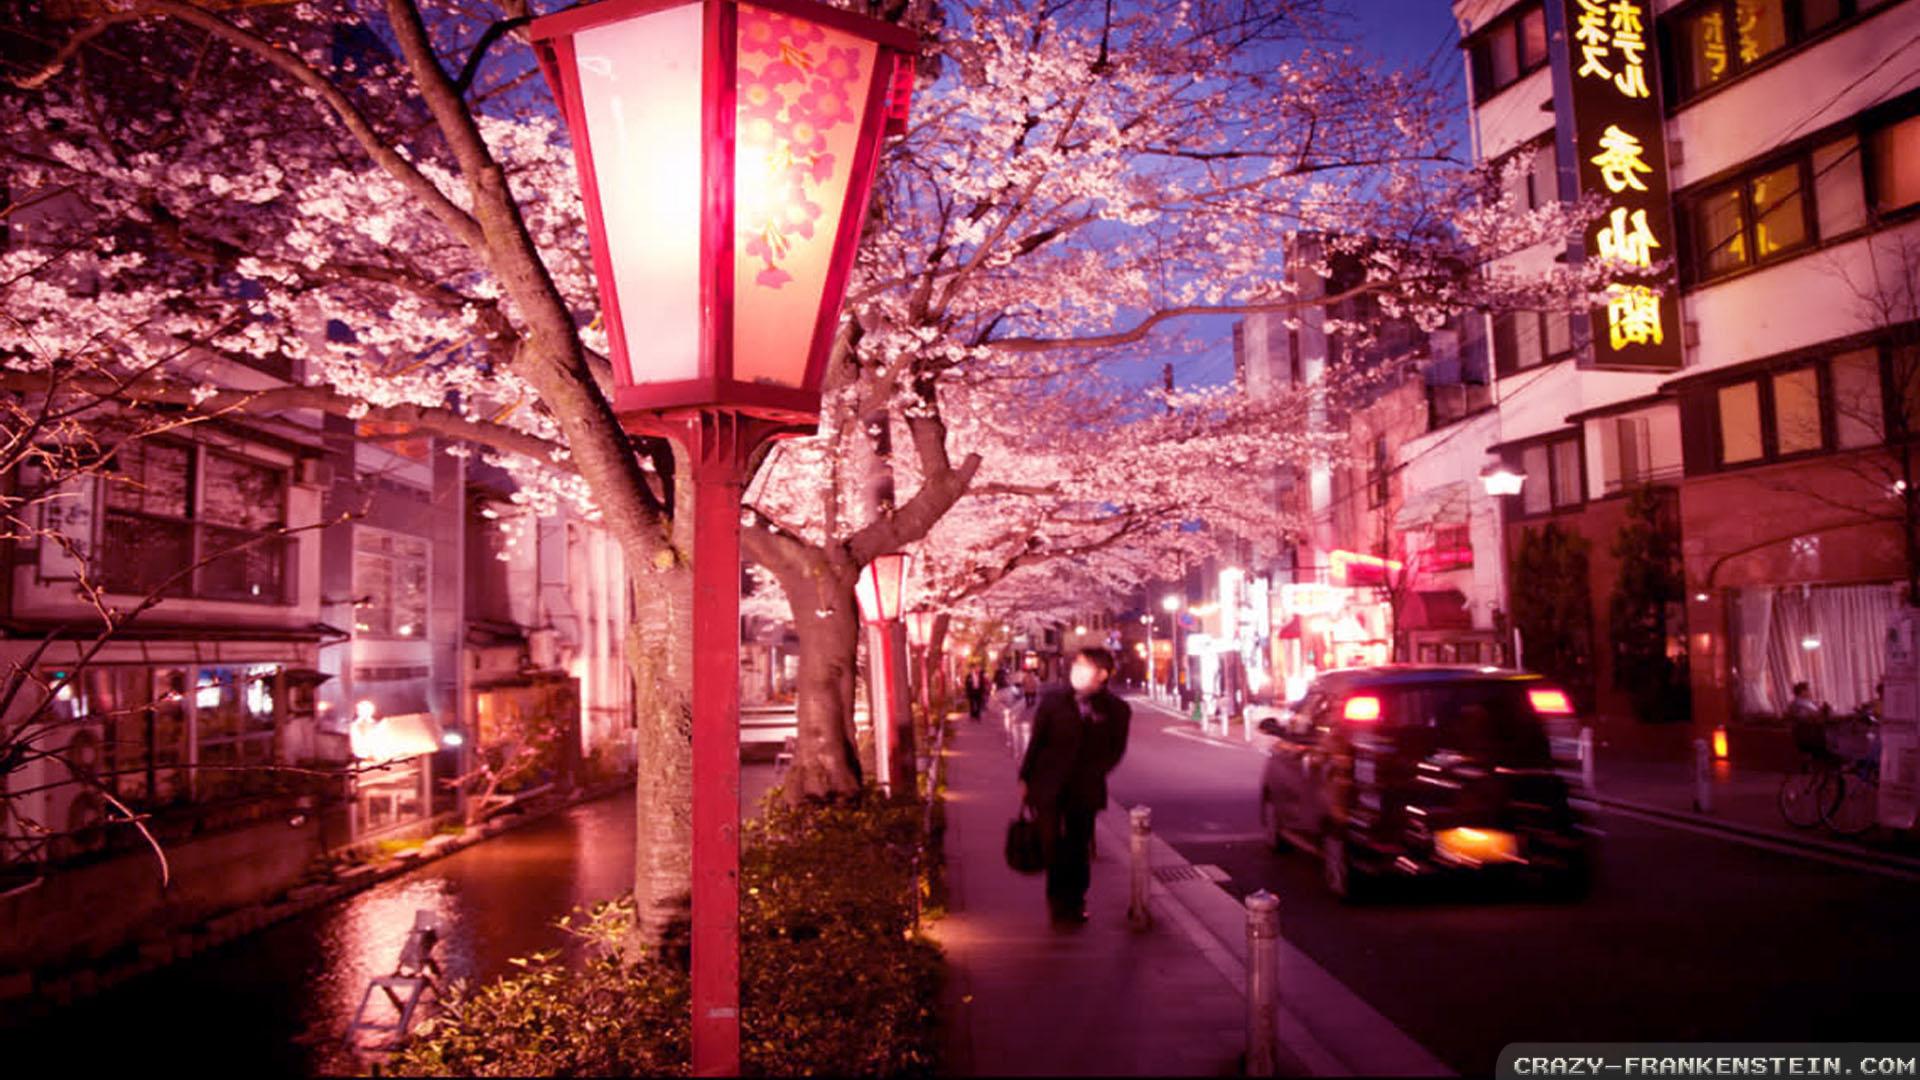 night-bloom-summer-in-japan-wallpapers-1920x1080